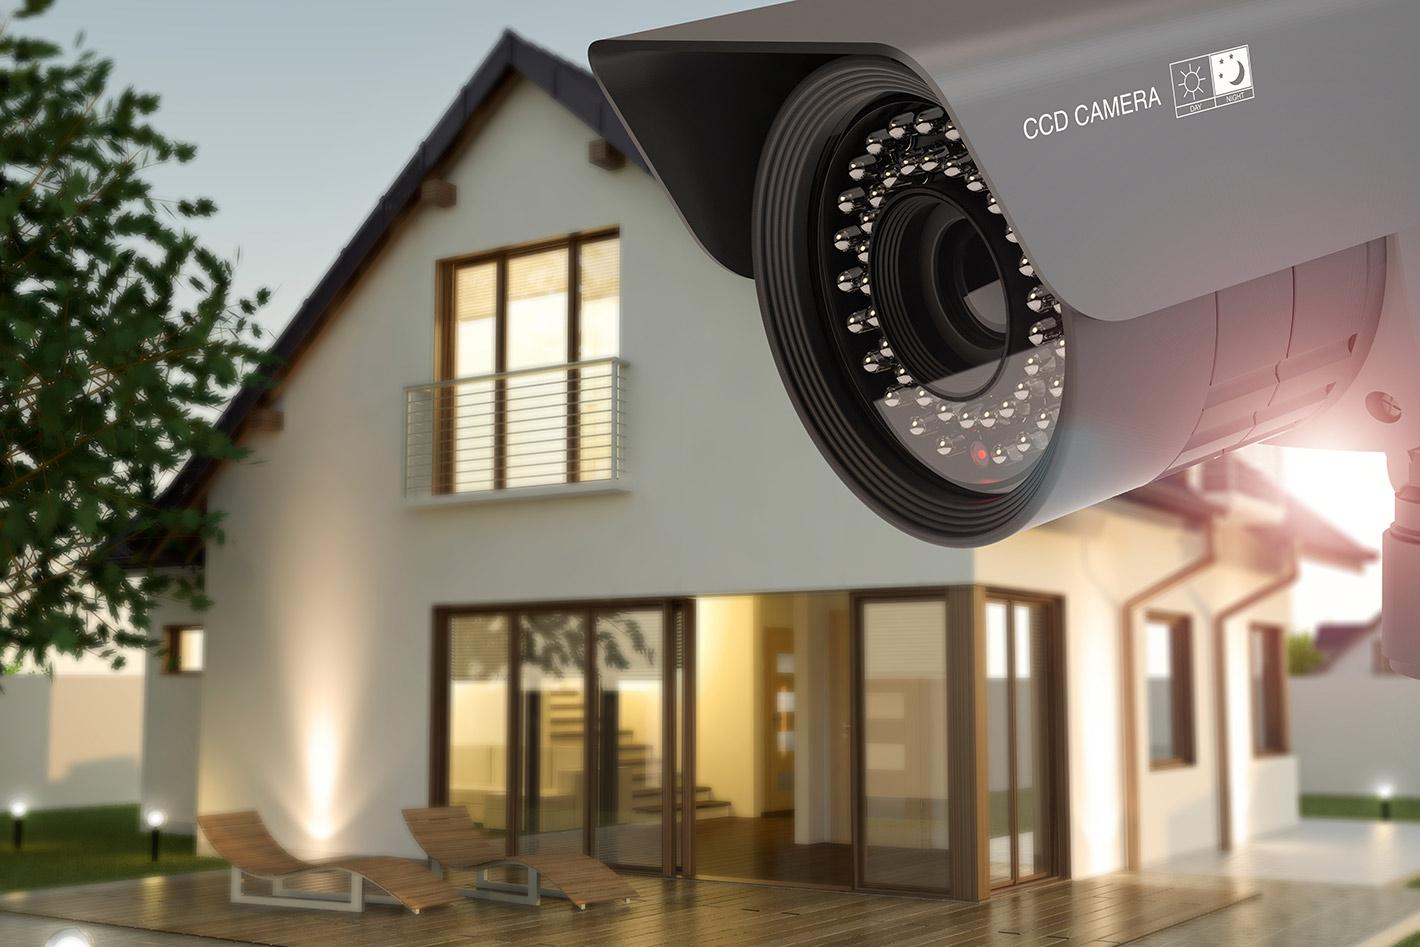 Dallas Locksmith Services - How Do You Identify Damaged Locks?